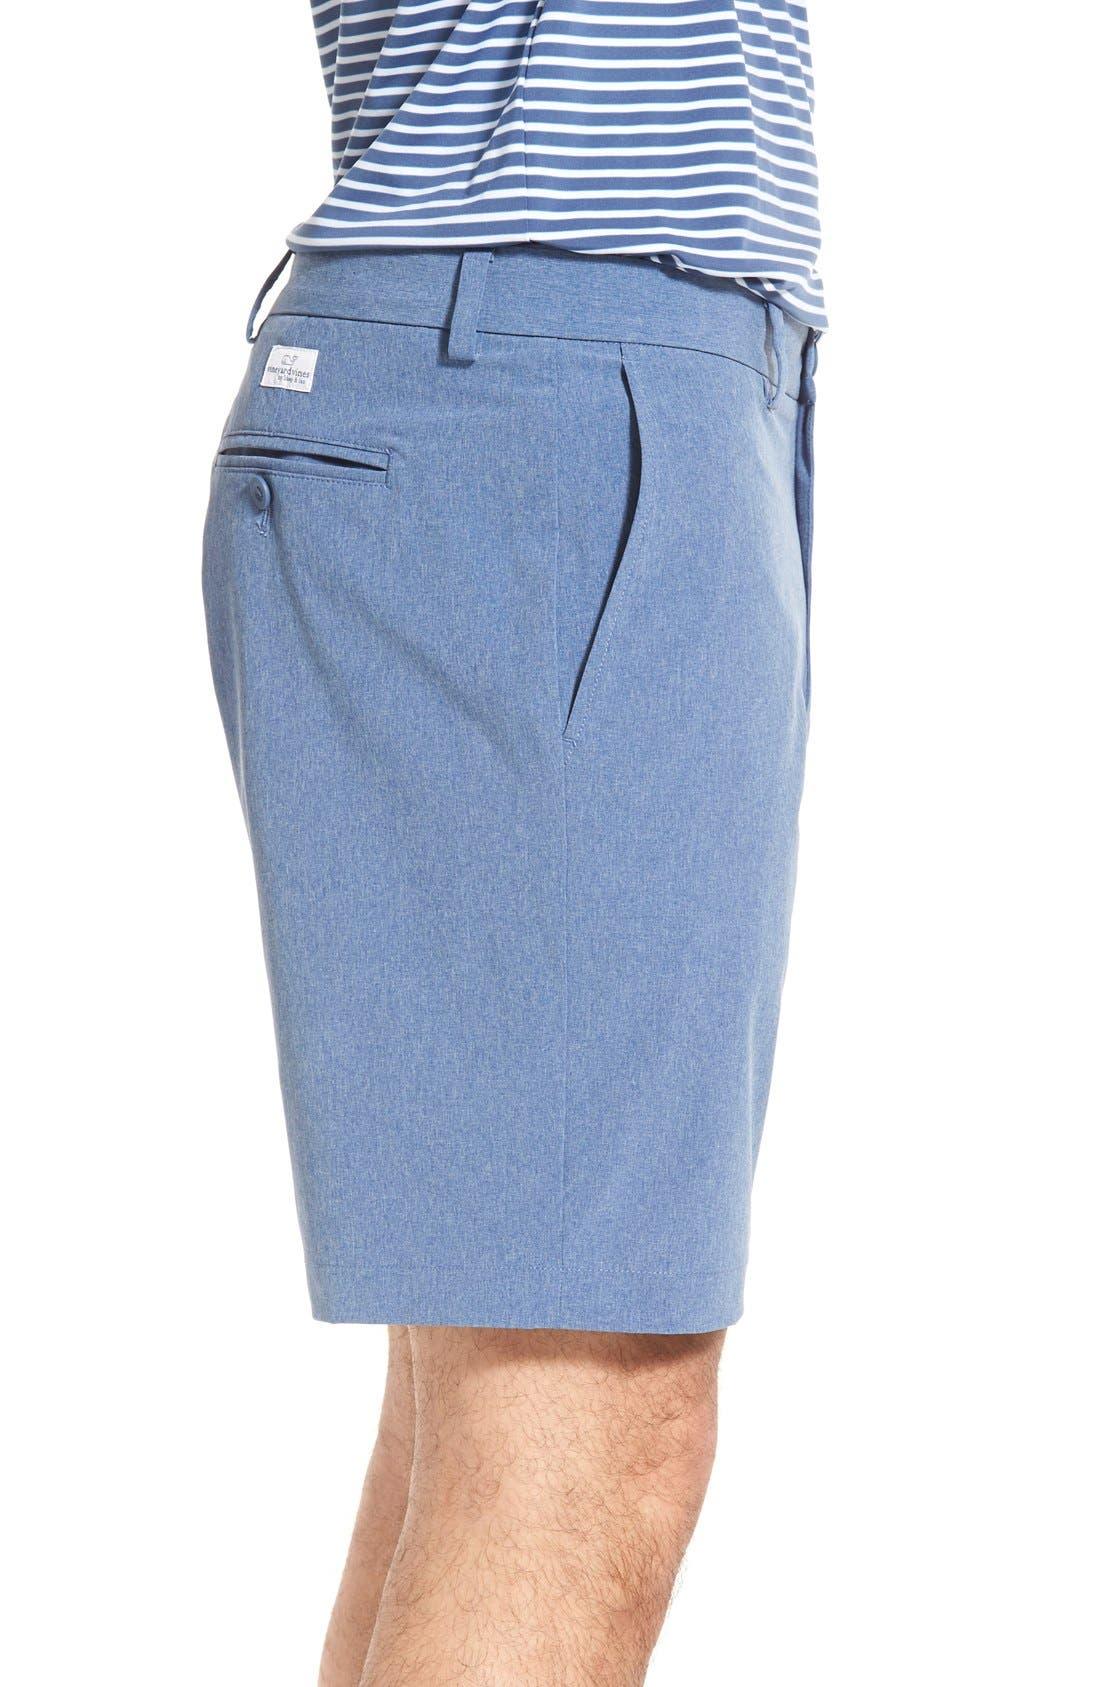 8 Inch Performance Breaker Shorts,                             Alternate thumbnail 40, color,